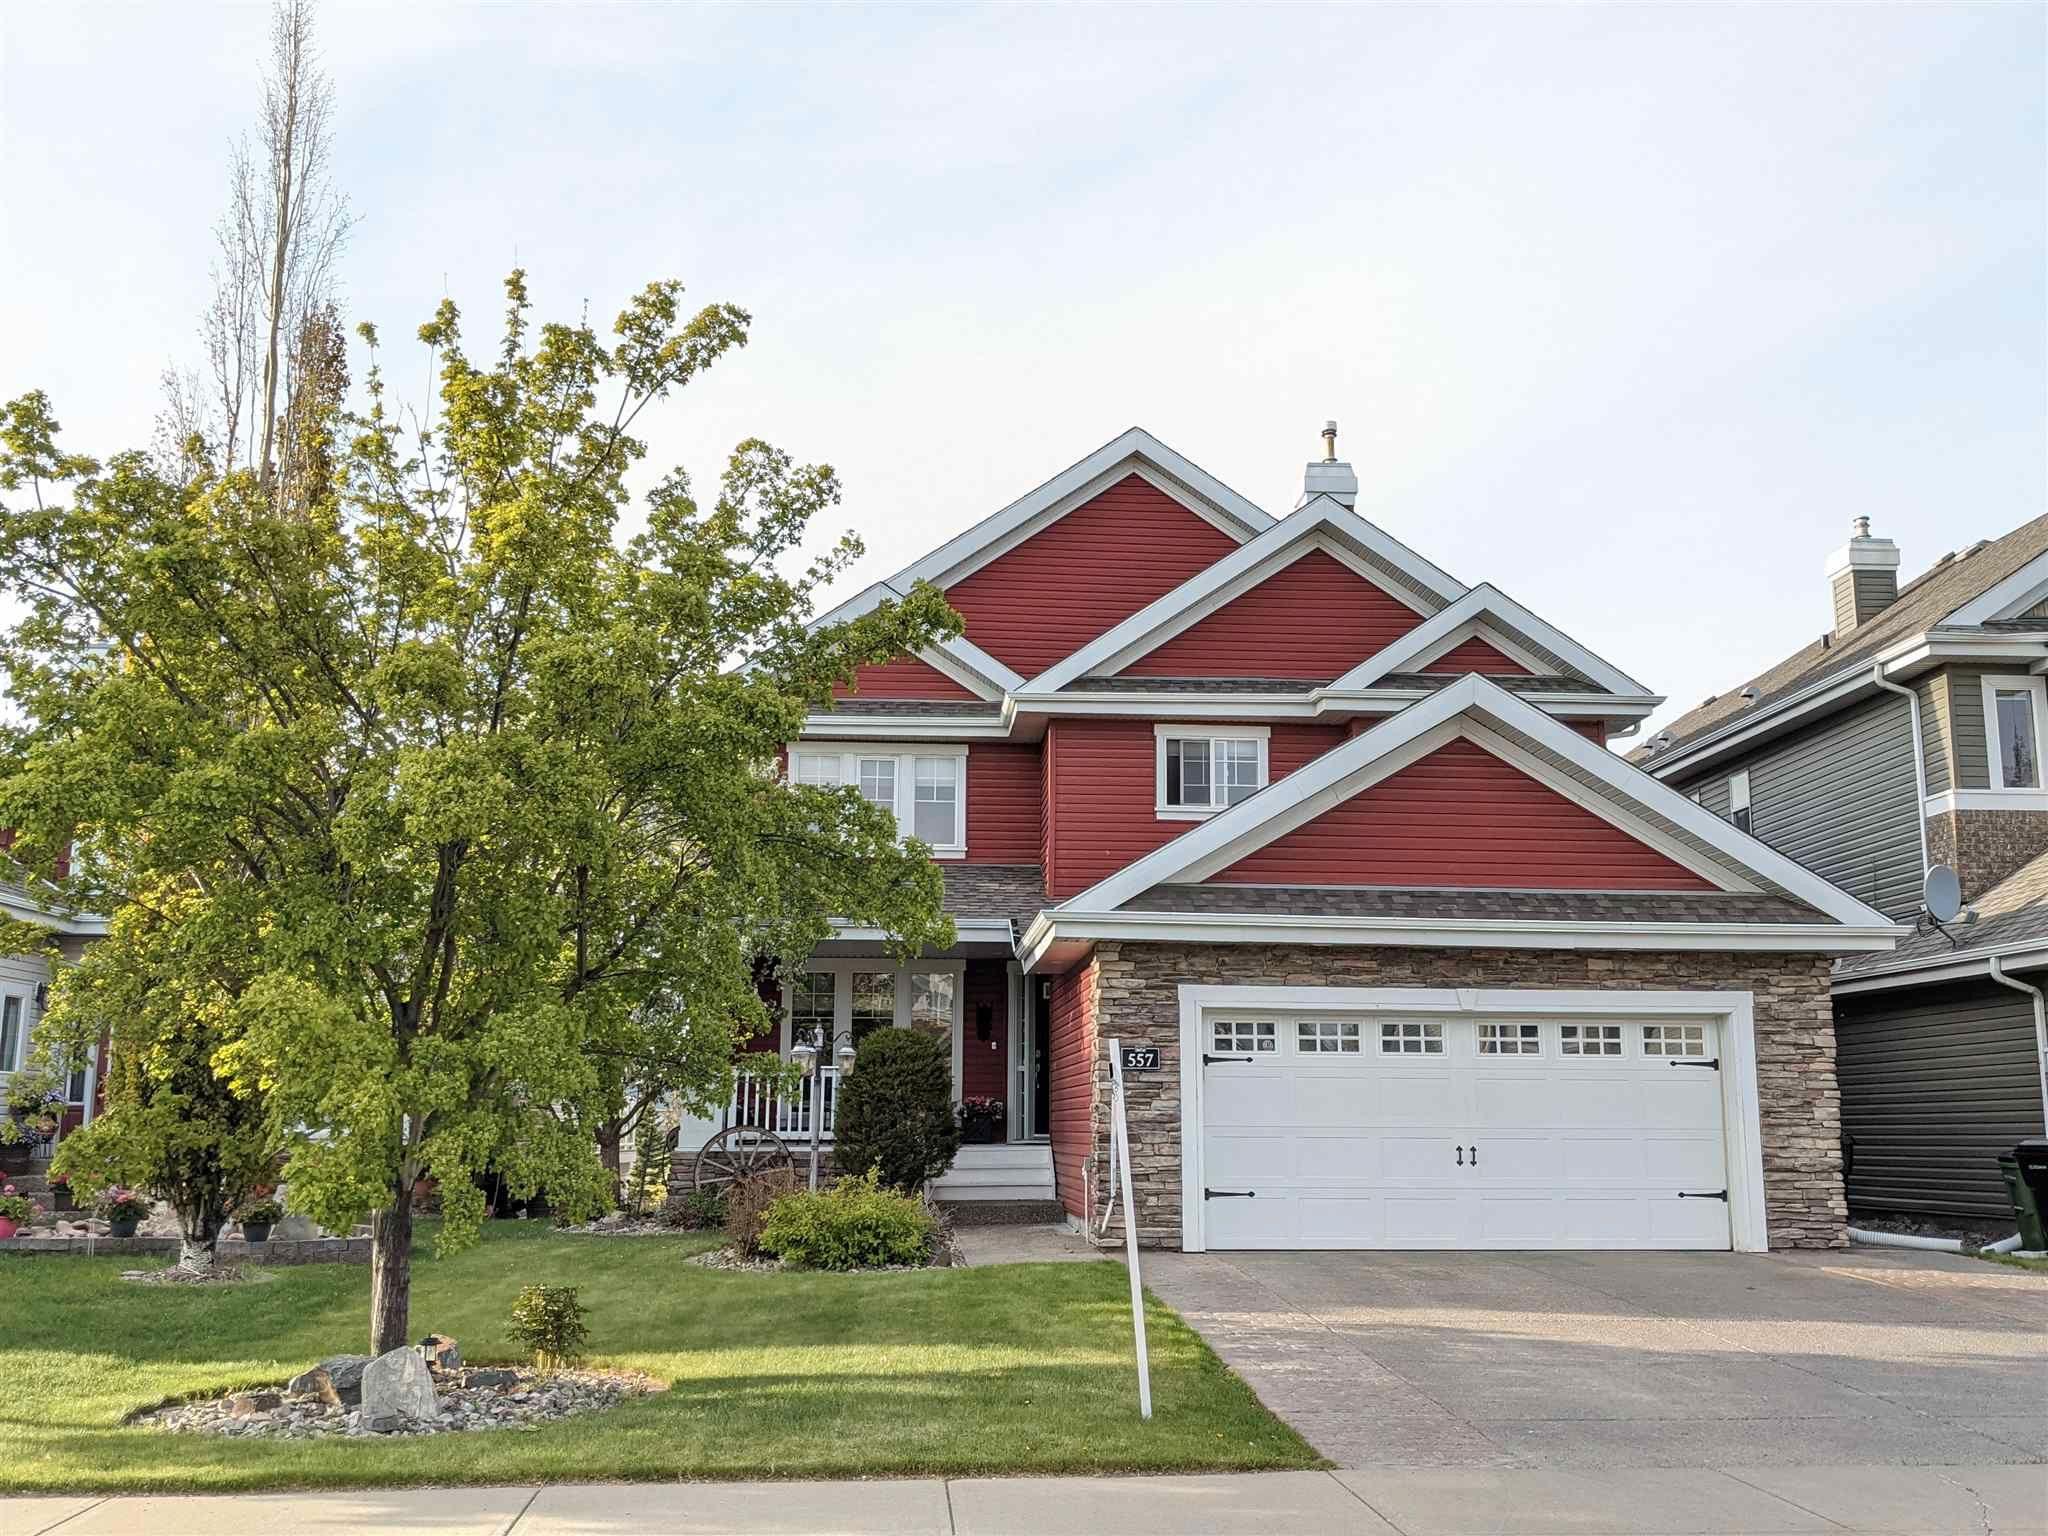 Main Photo: 557 STEWART Crescent in Edmonton: Zone 53 House for sale : MLS®# E4241896